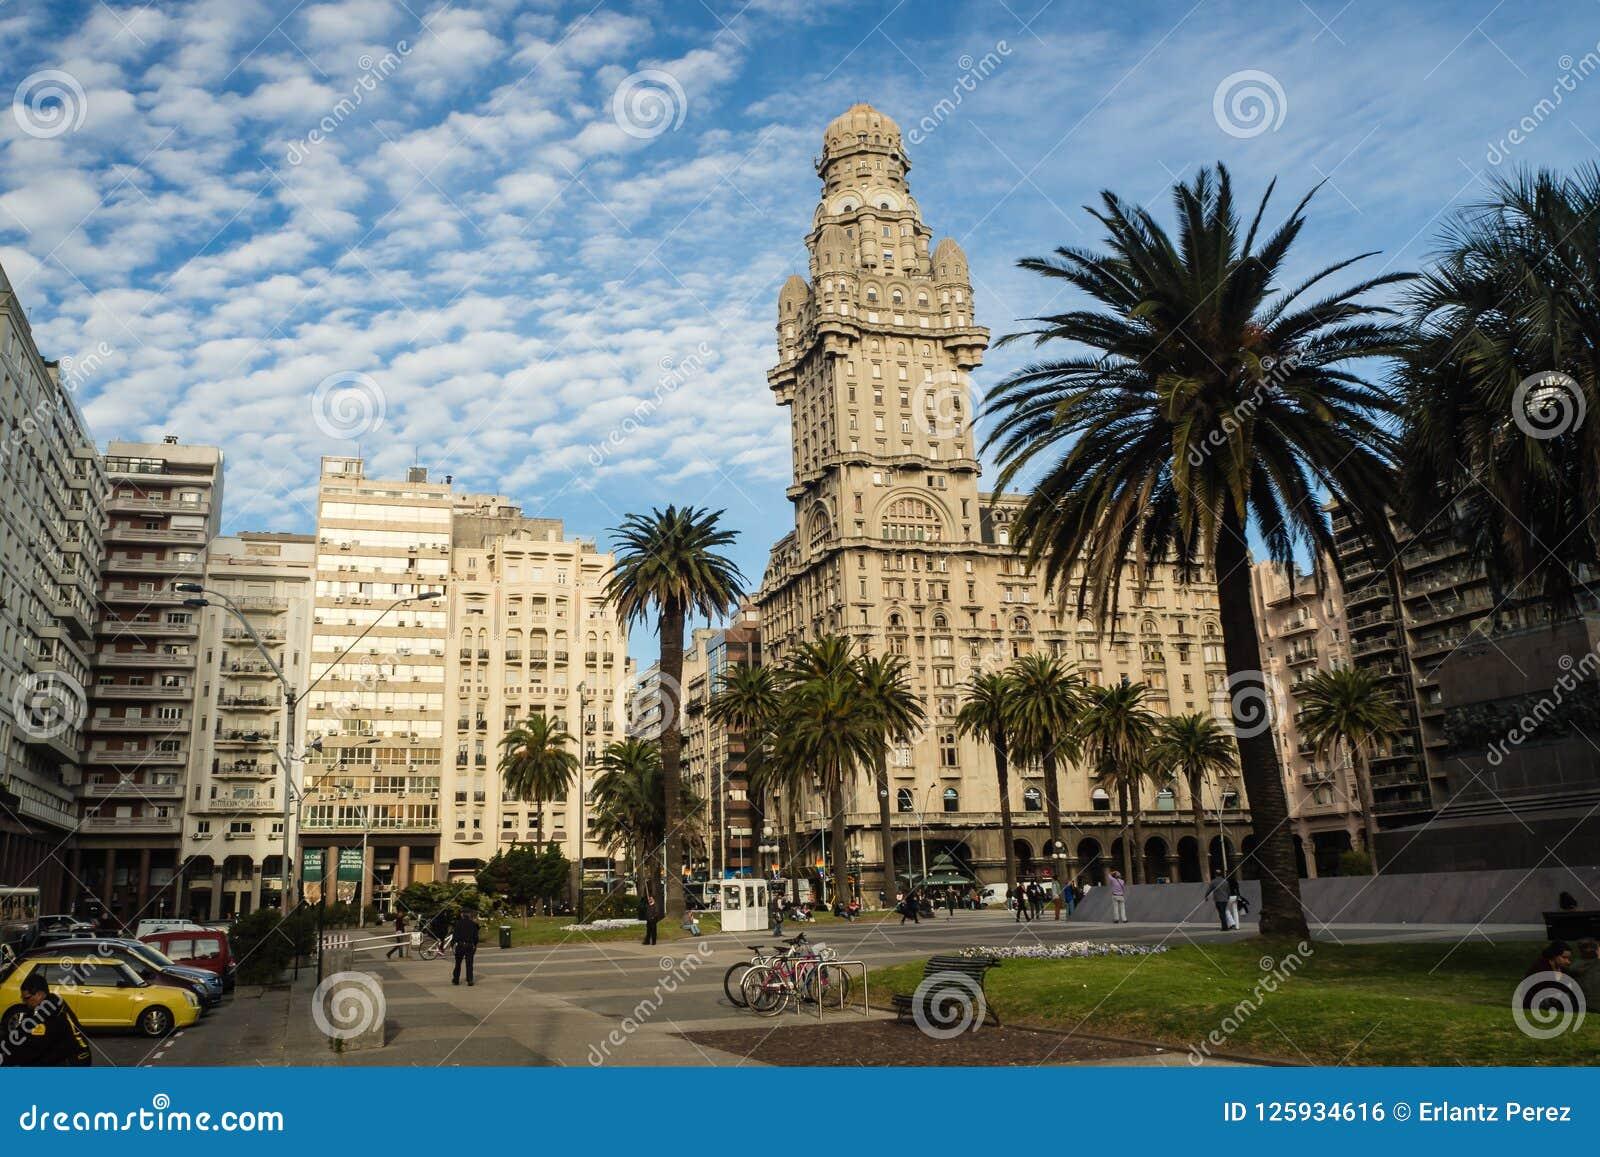 Main square in Montevideo, Plaza de la independencia, Salvo palace